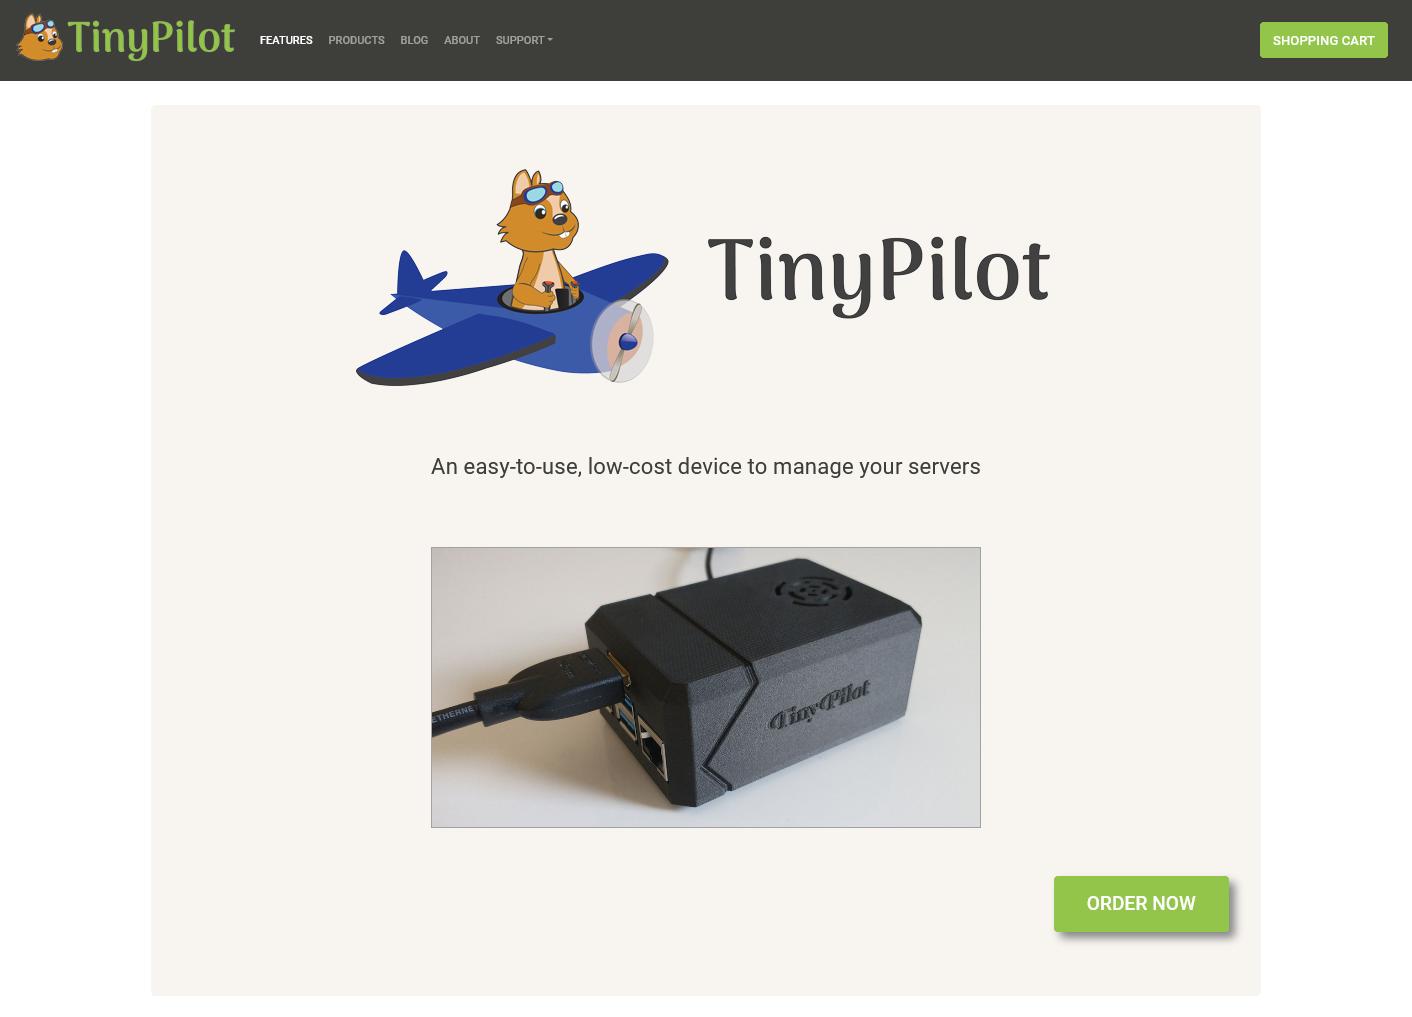 Screenshot of TinyPilot website